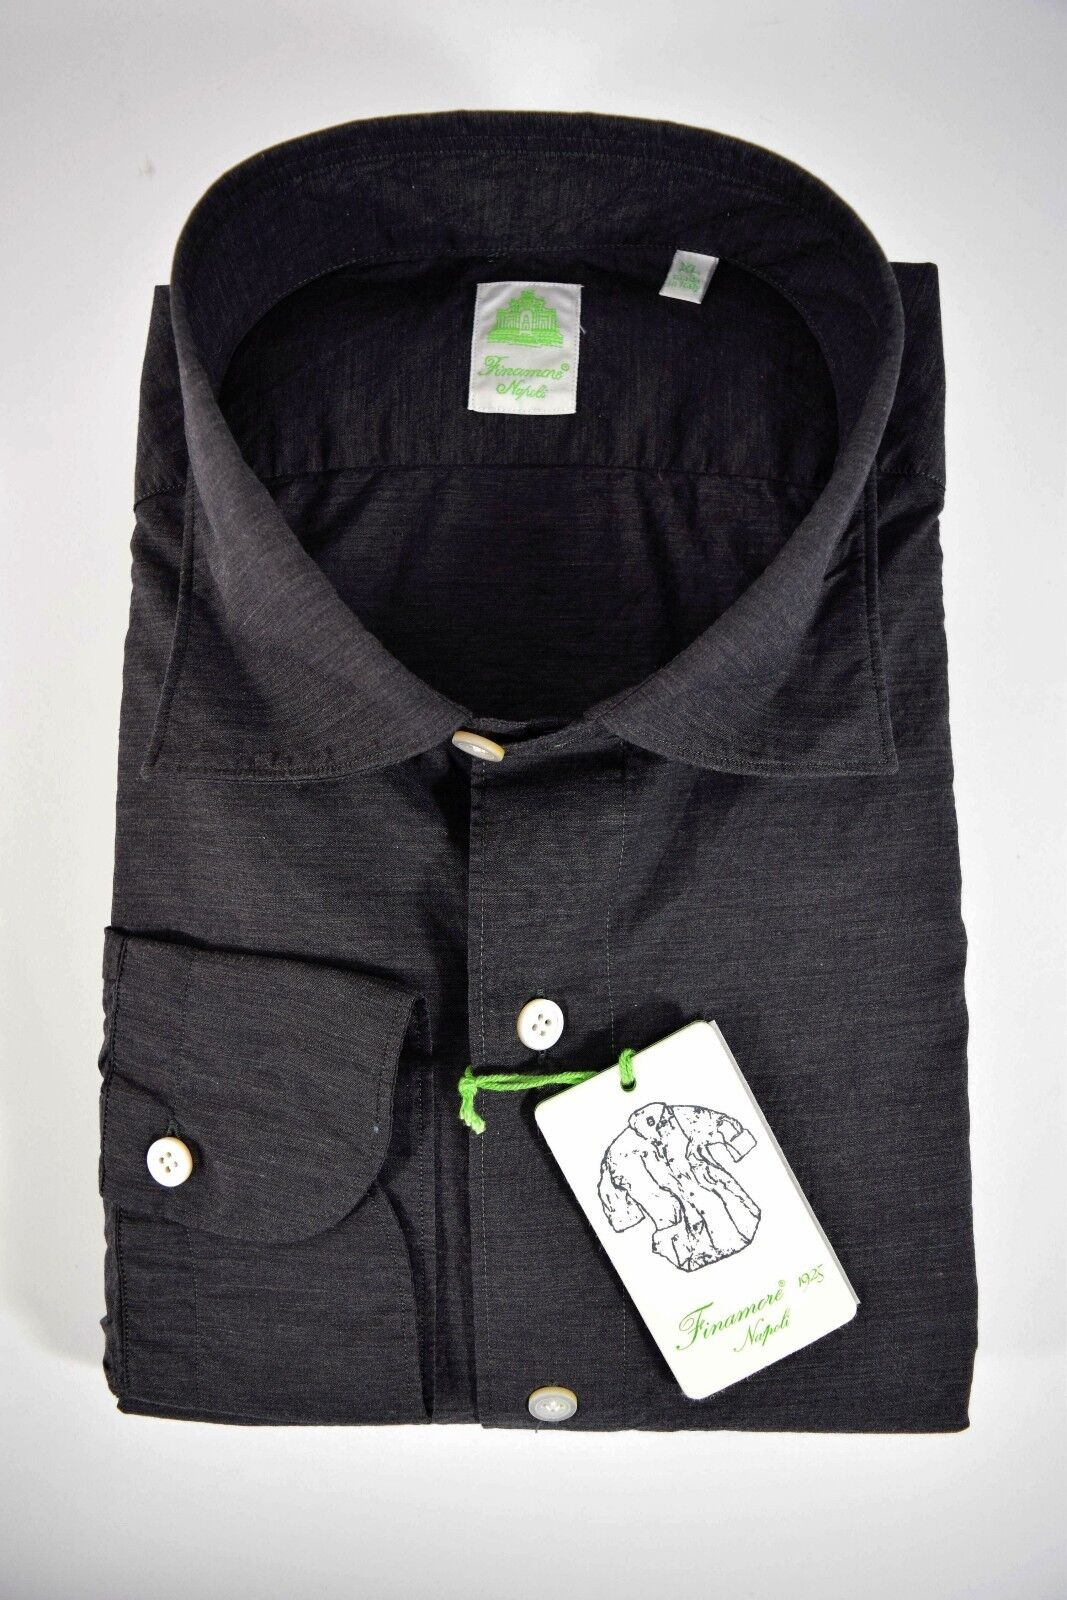 FINAMORE camicia UOMO sartoriale casual 100% COTONE grigio scuro tg. XL-XXL-3XL